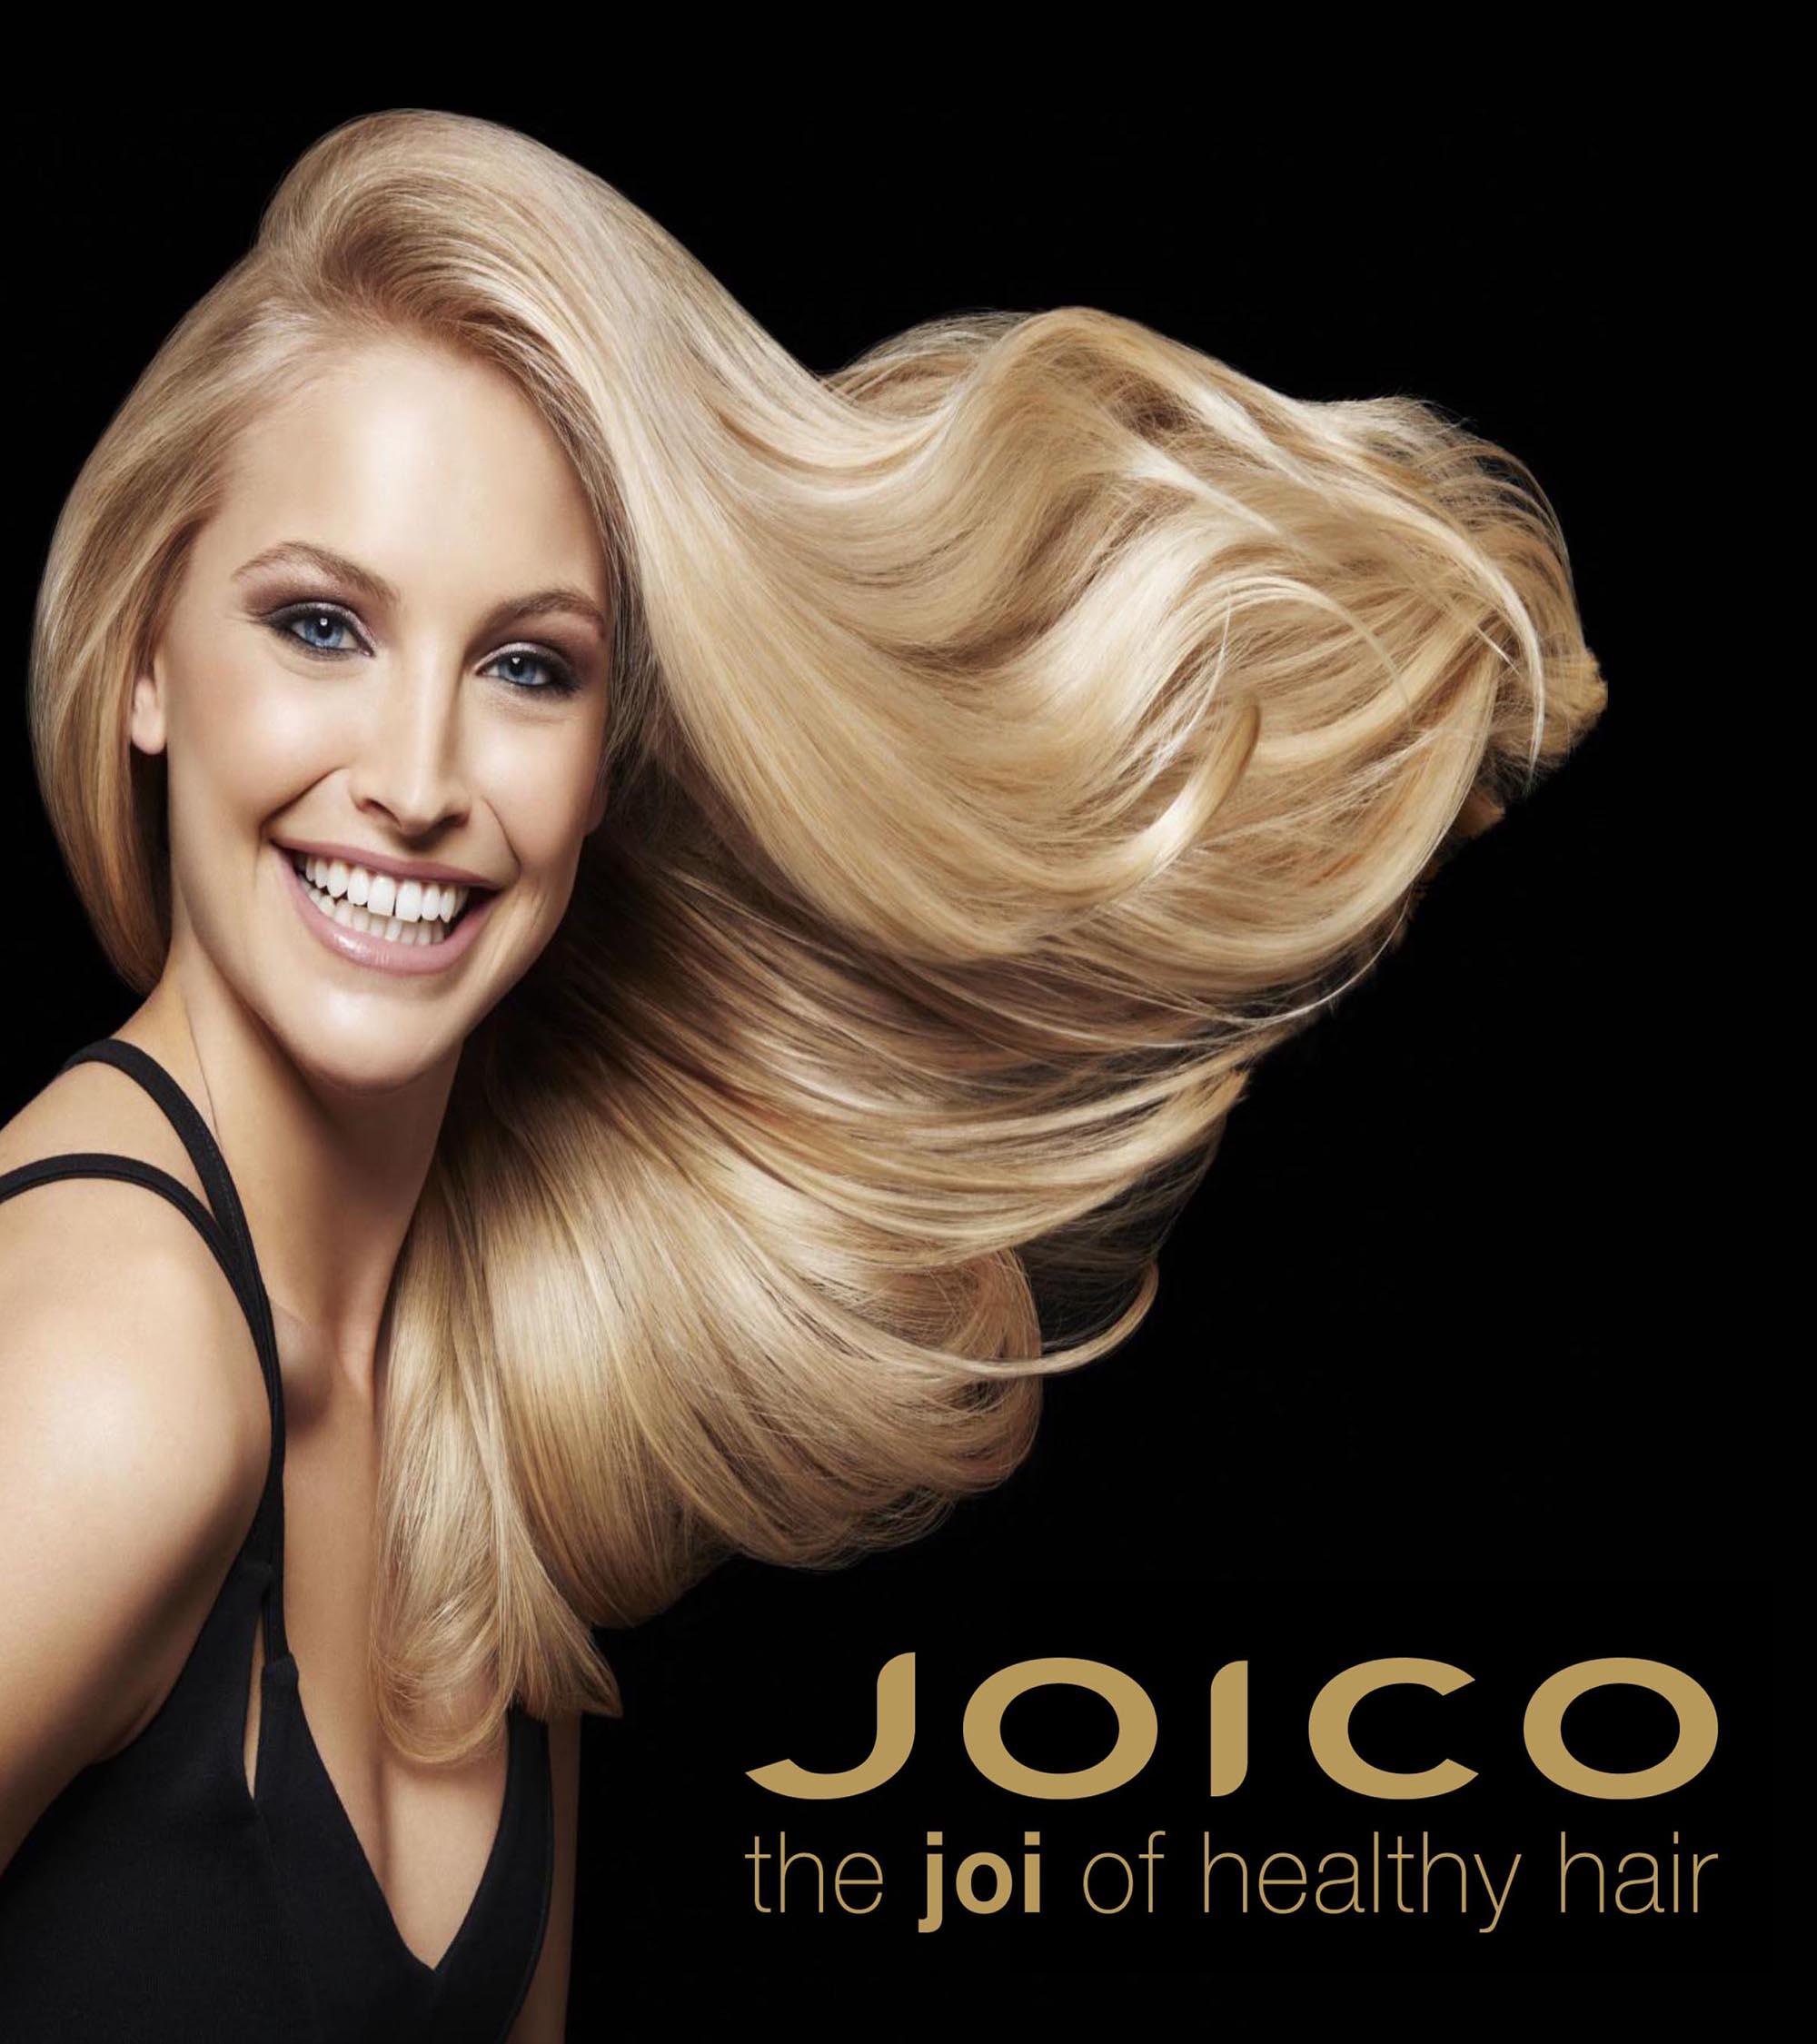 JOICO- The joy of a healthy hear